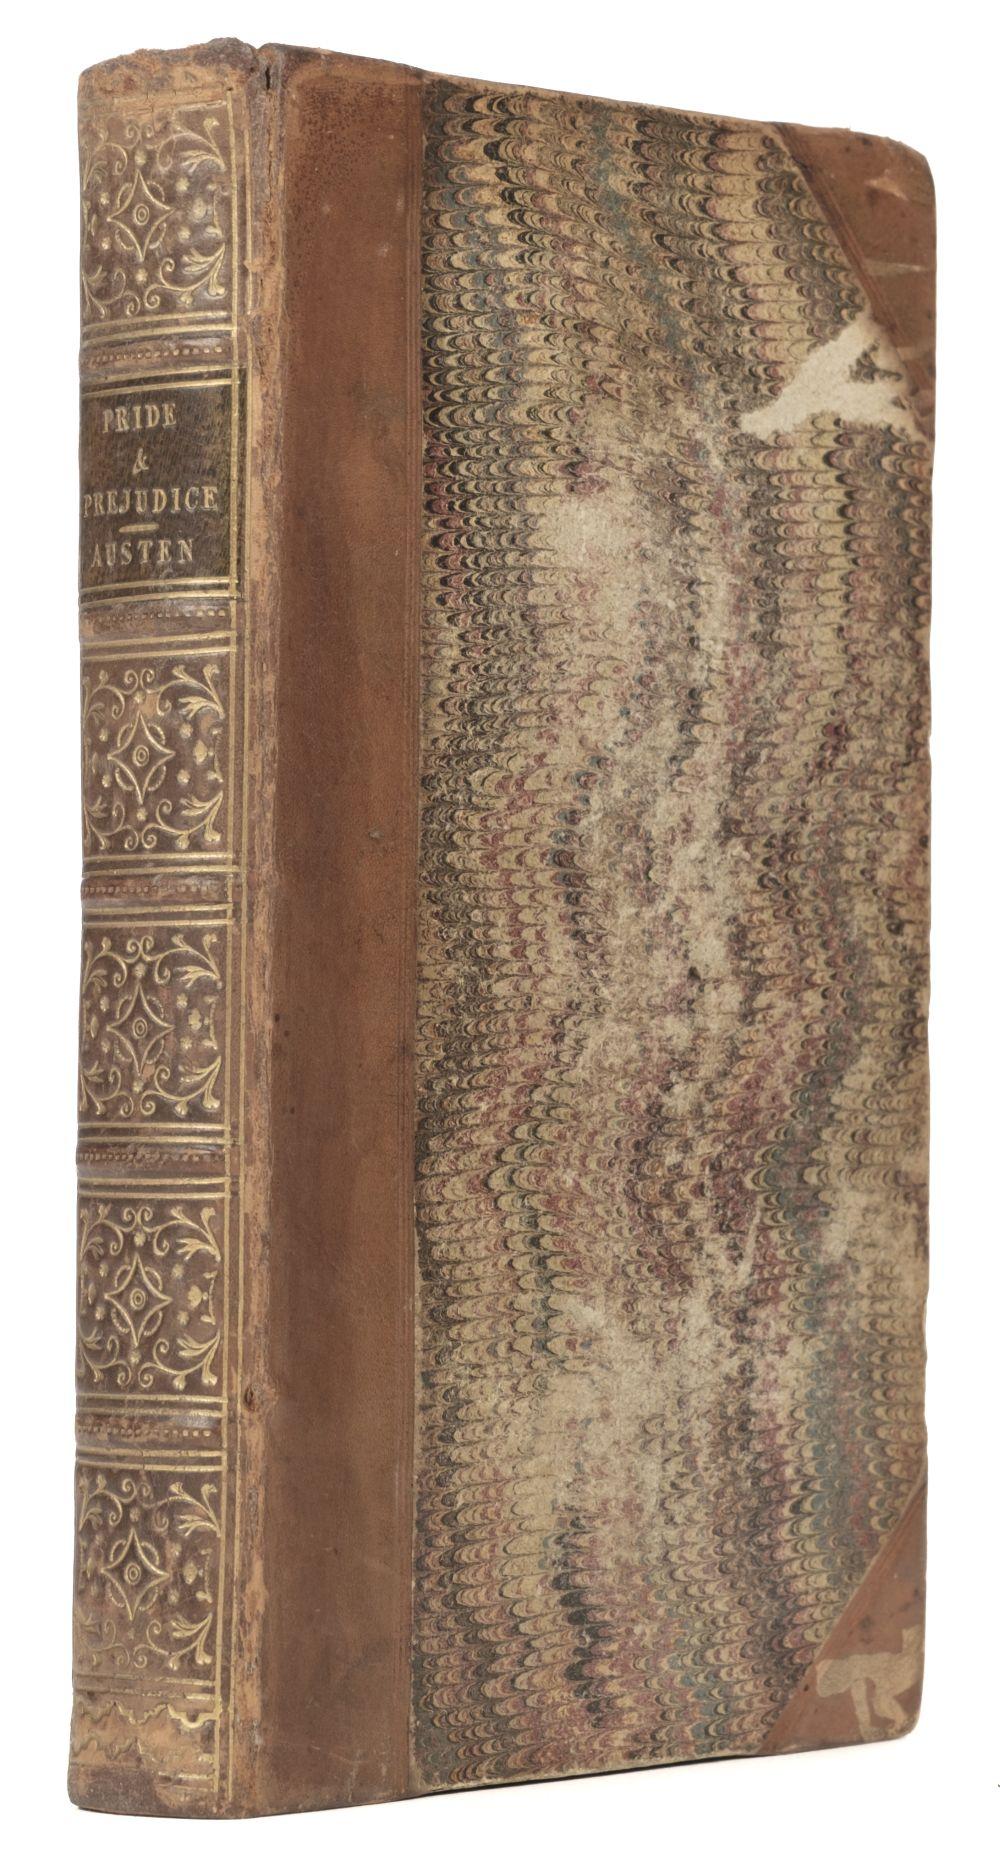 Austen (Jane). Pride and Prejudice. A Novel, London: Richard Bentley, 1846